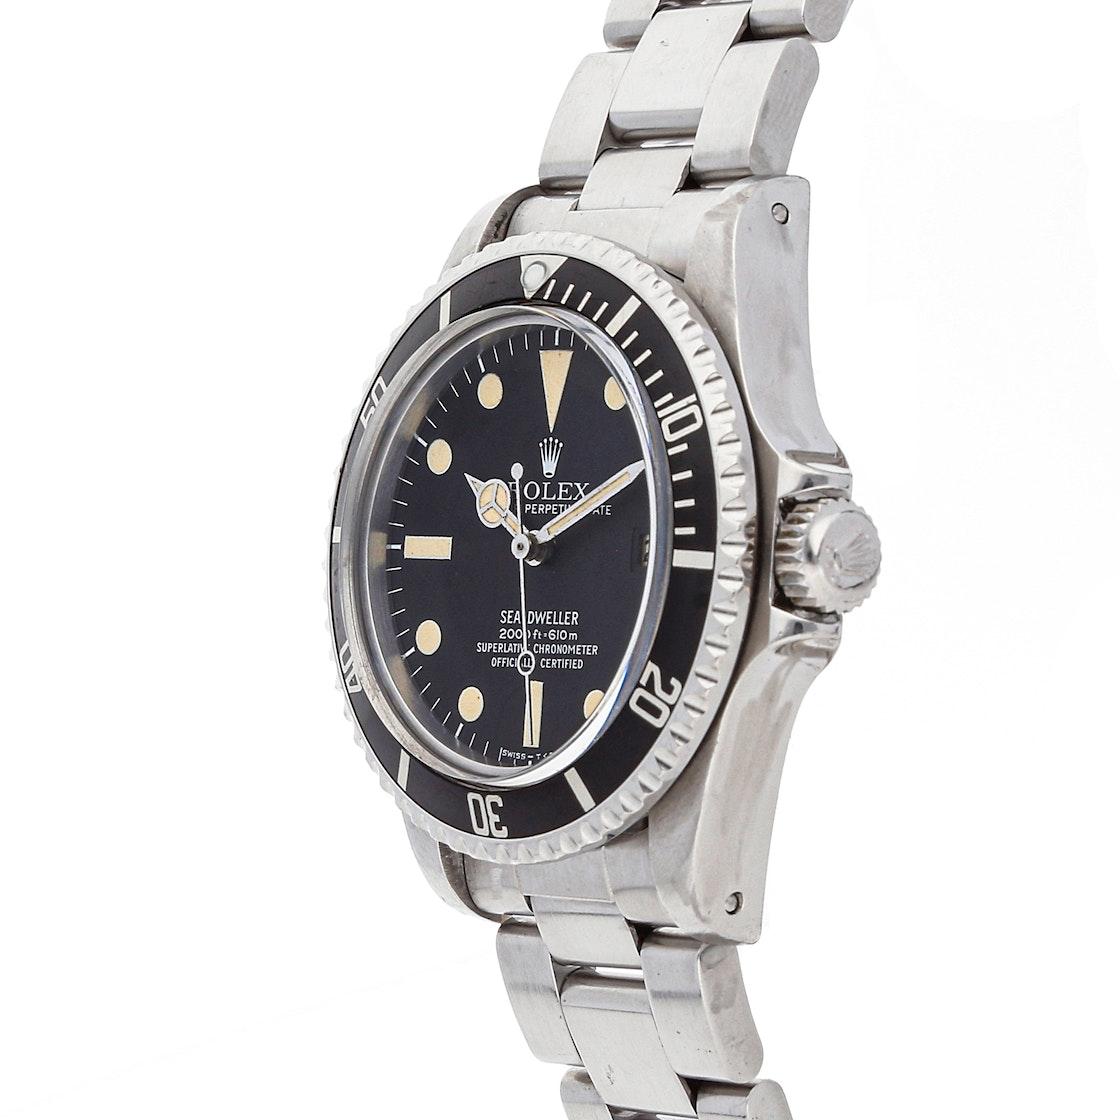 Rolex Vintage Sea-Dweller 1665